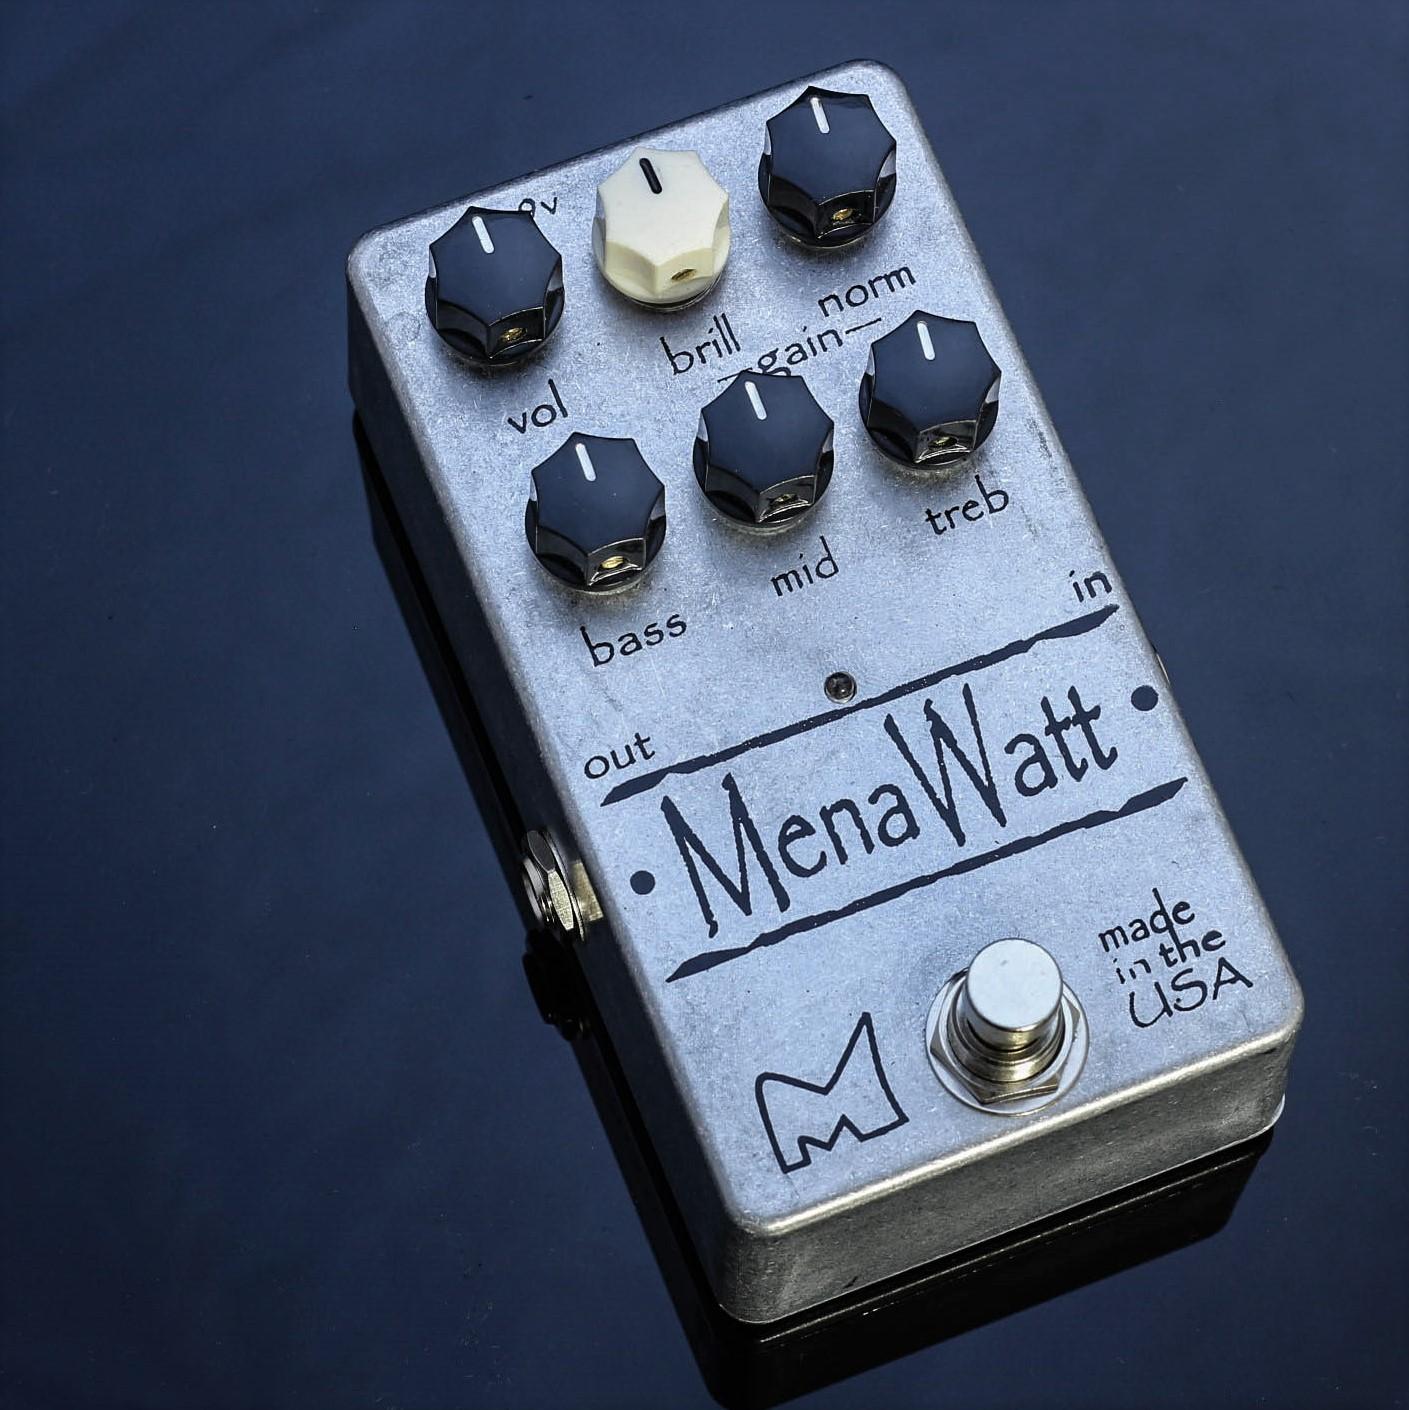 MenaWatt